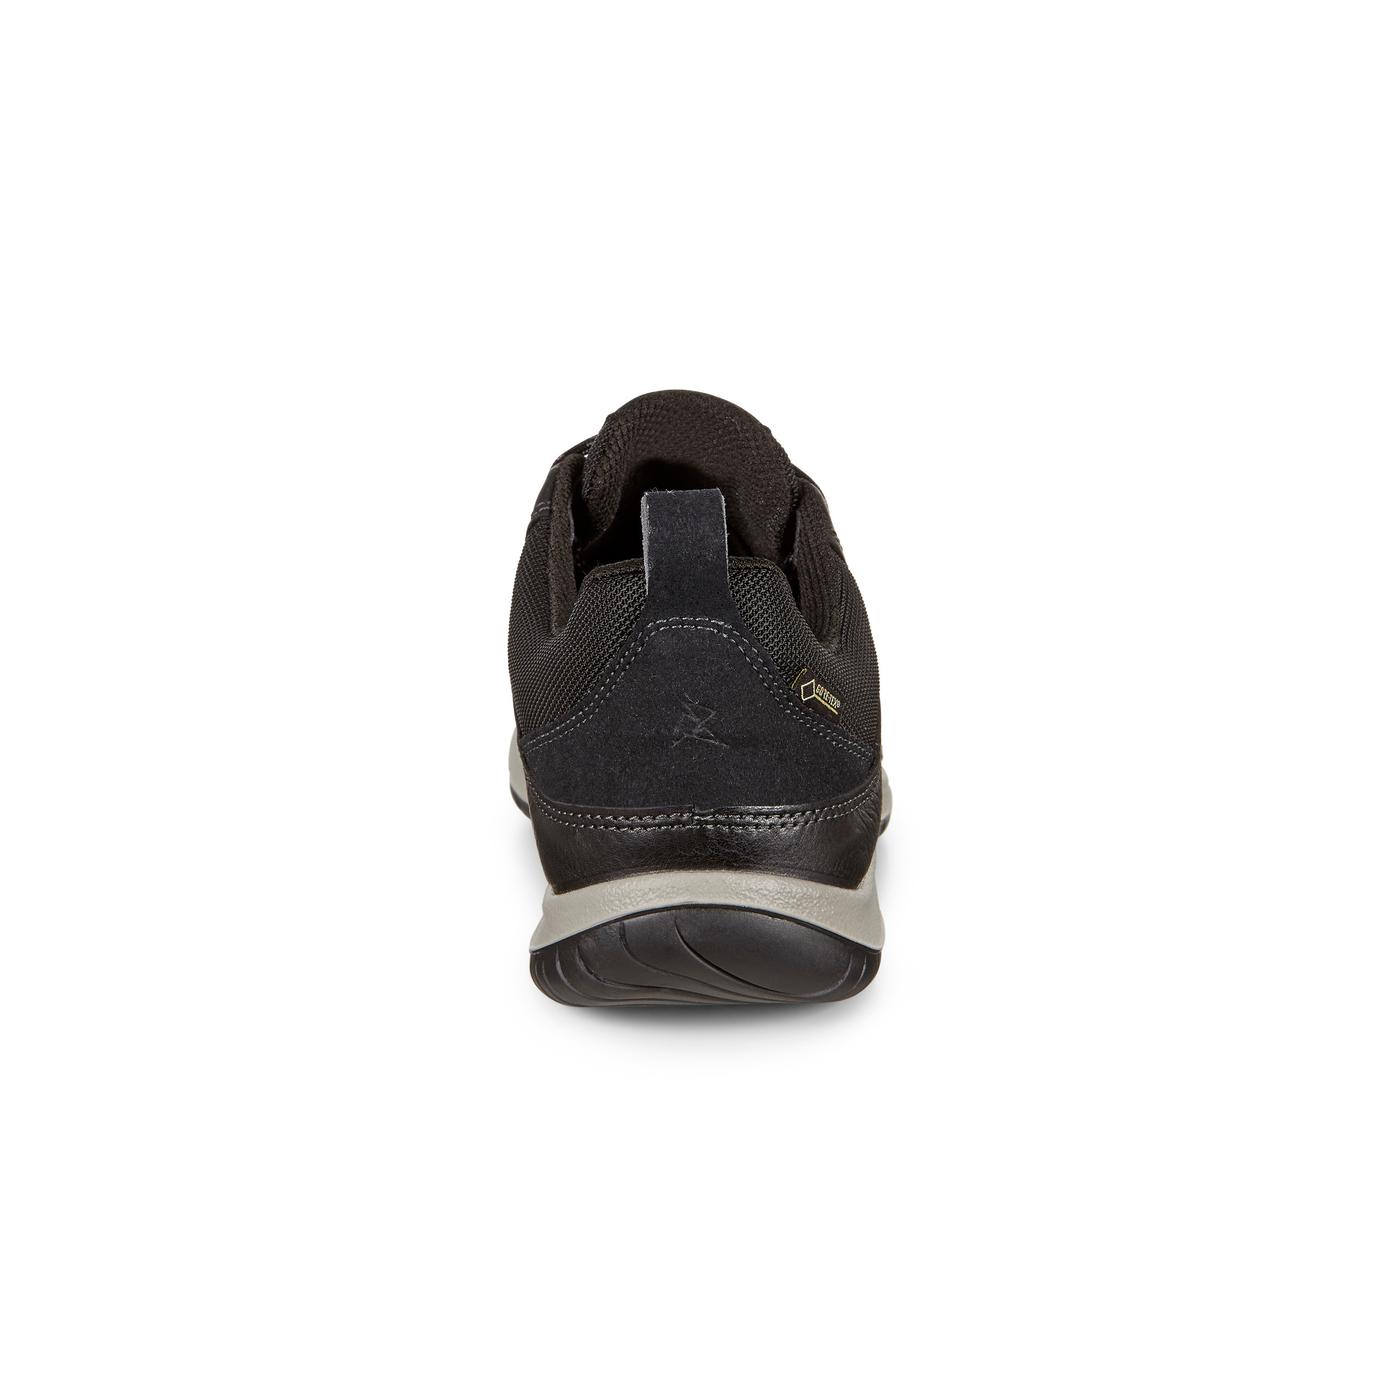 326e52fe989 ECCO Womens Aspina Low GTX Tie   Hiking Shoes   ECCO® Shoes